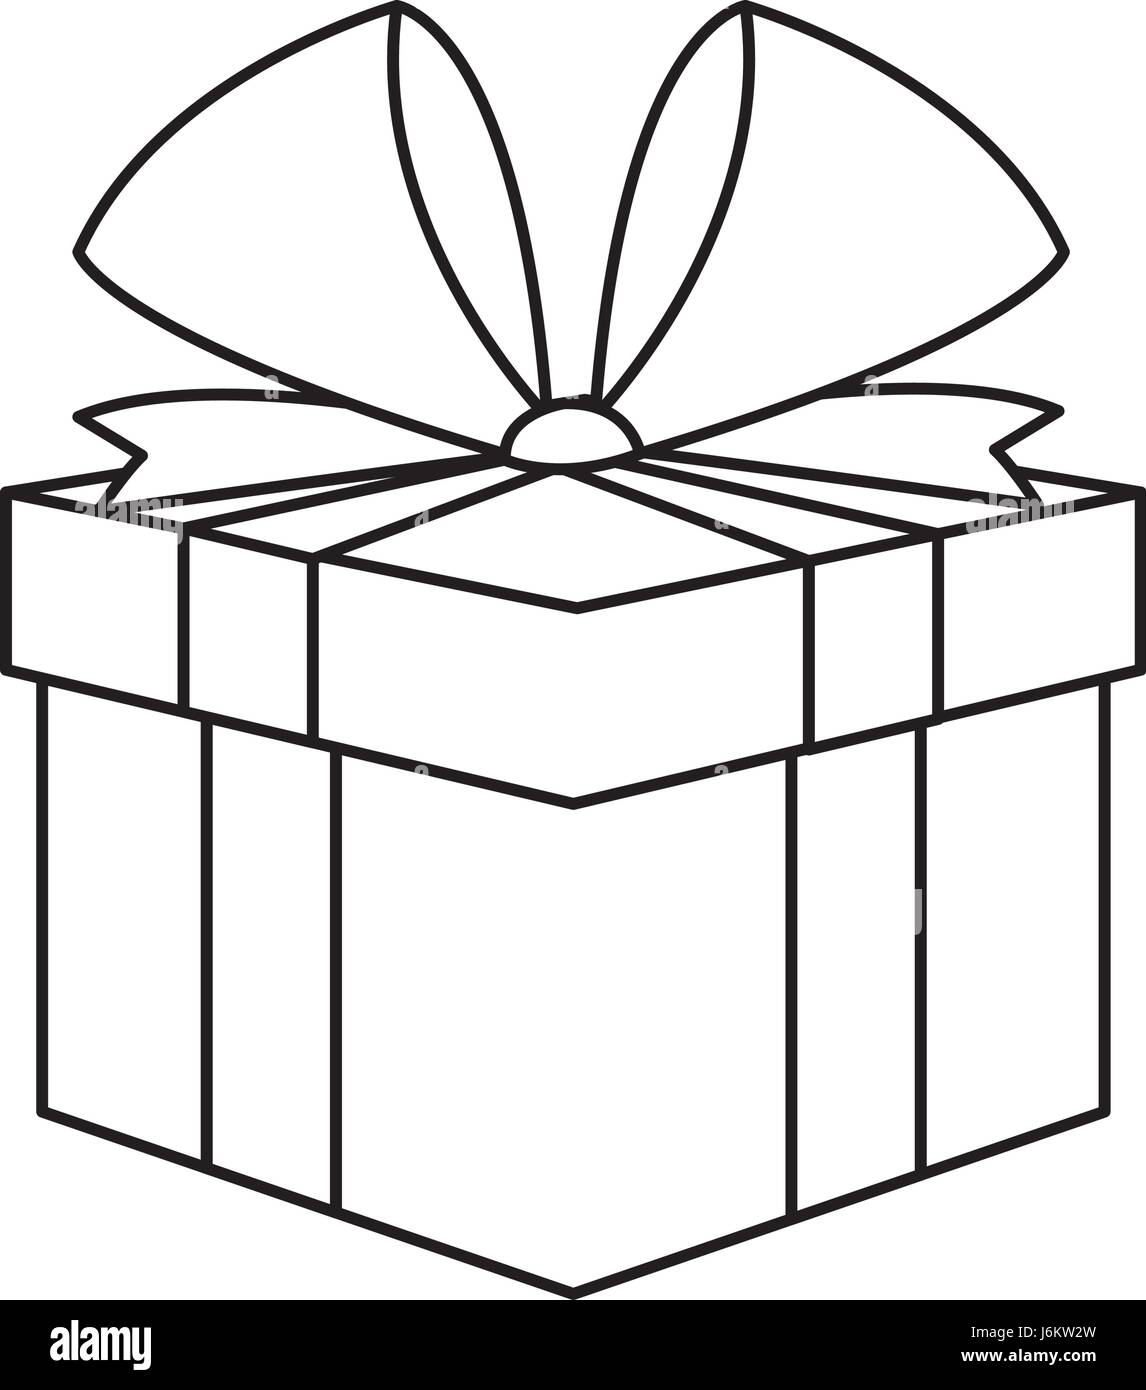 Christmas present box gift ribbon decoration outline stock